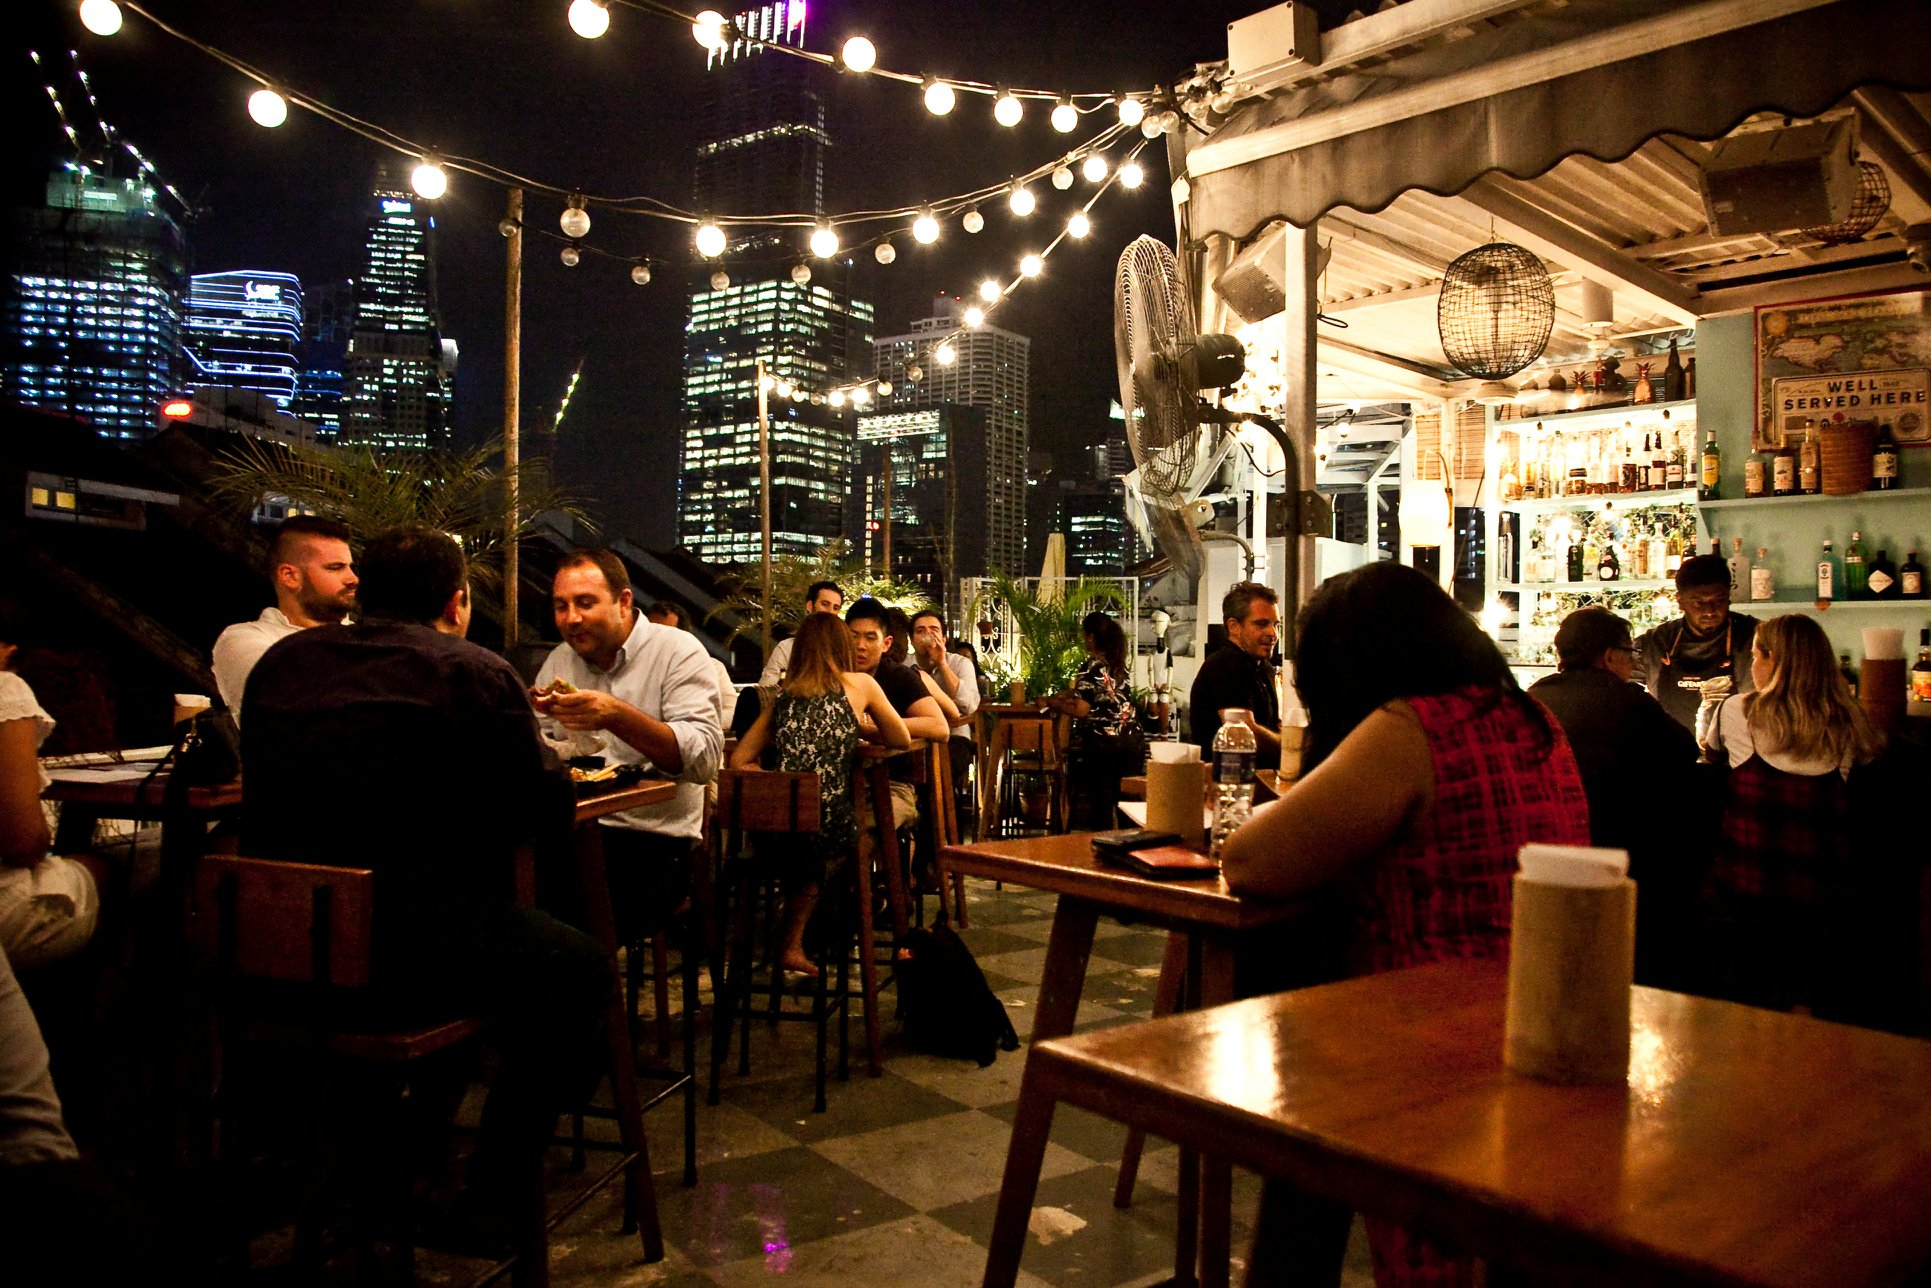 potato head bar at one of the best neighbourhoods in singapore keong saik